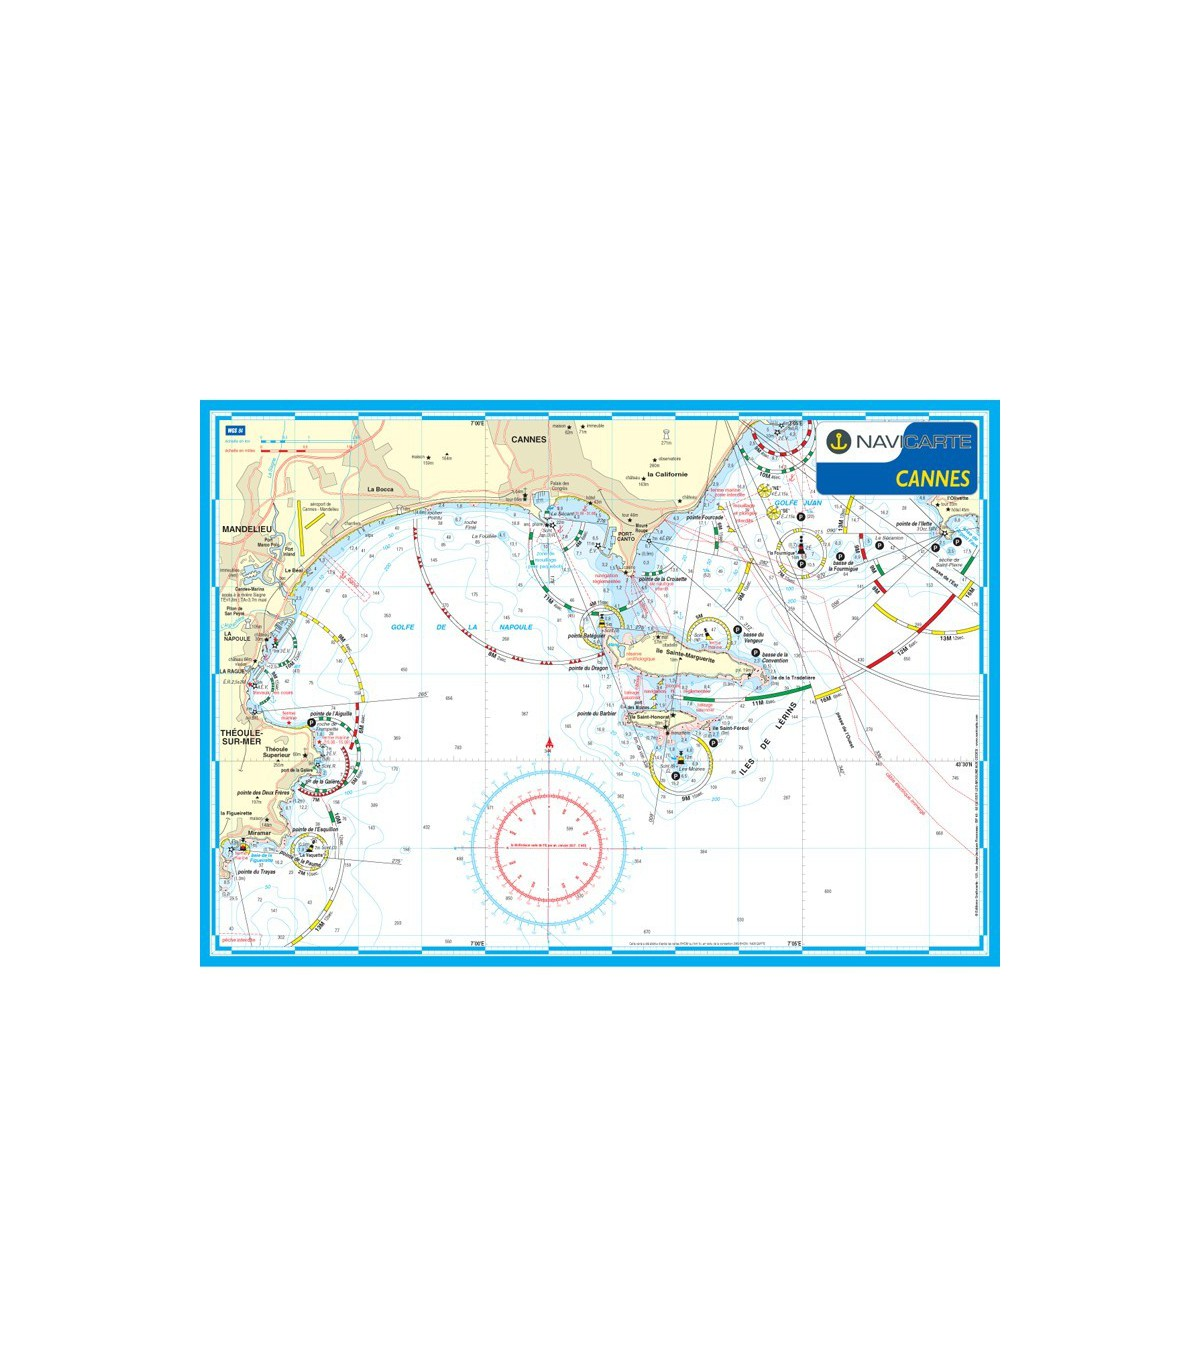 Carte Marine Carte Marine Plastifiee Mininav Cannes Veritable Carte